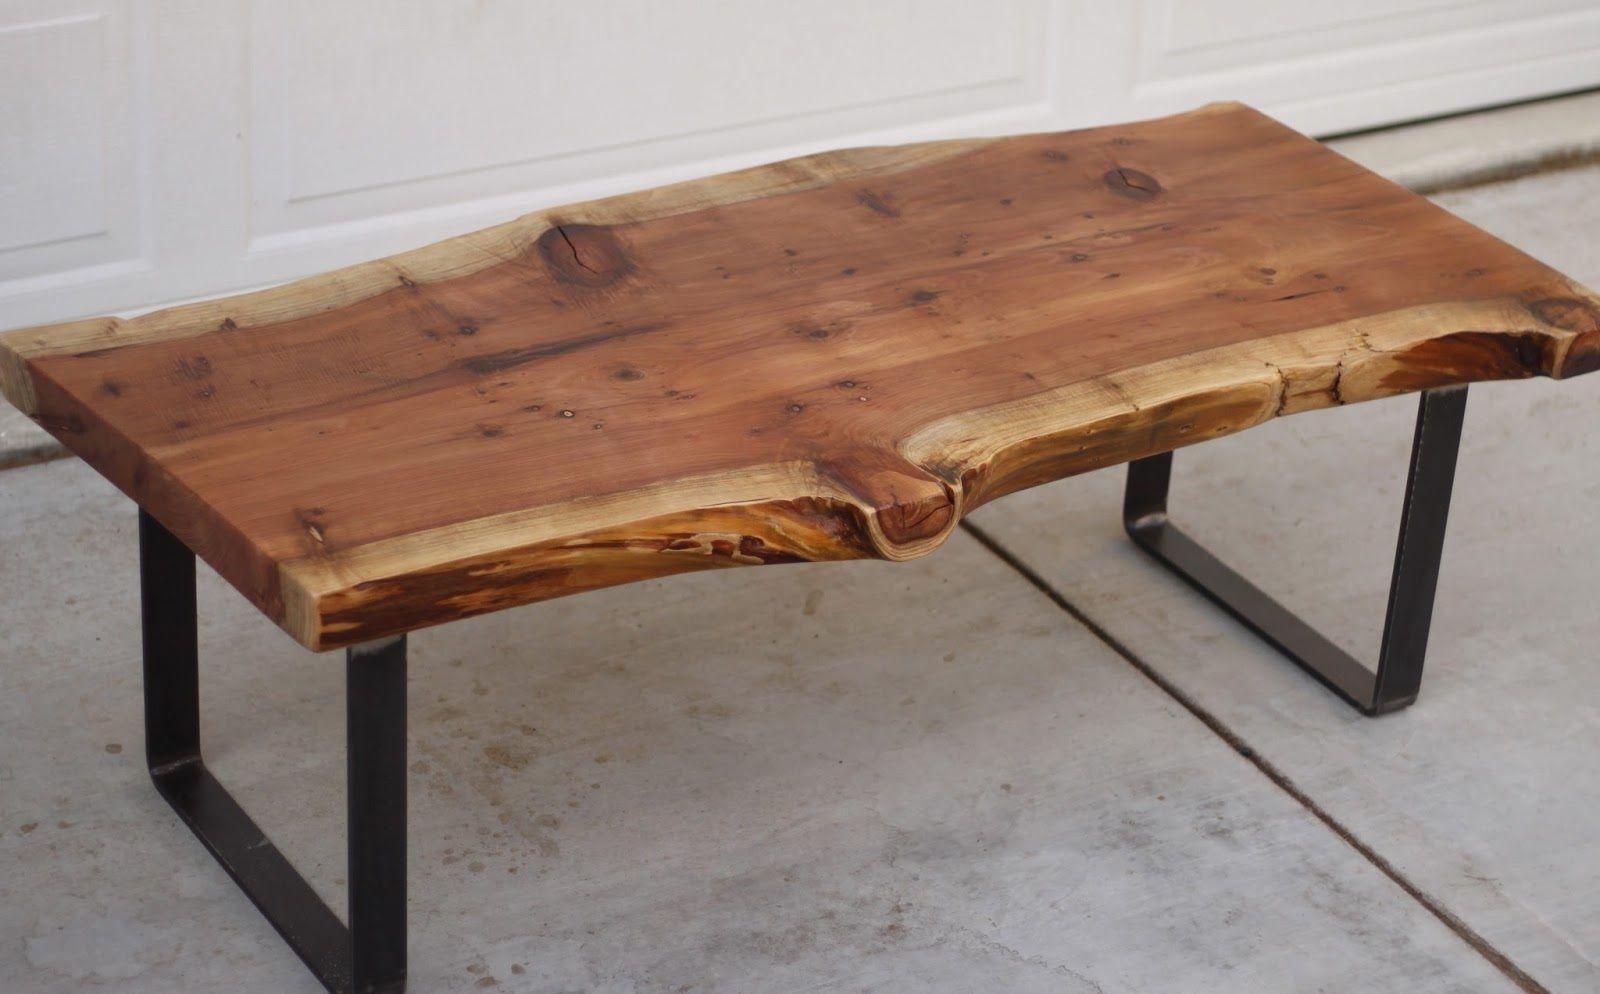 Inspiring Reclaimed Wood Table